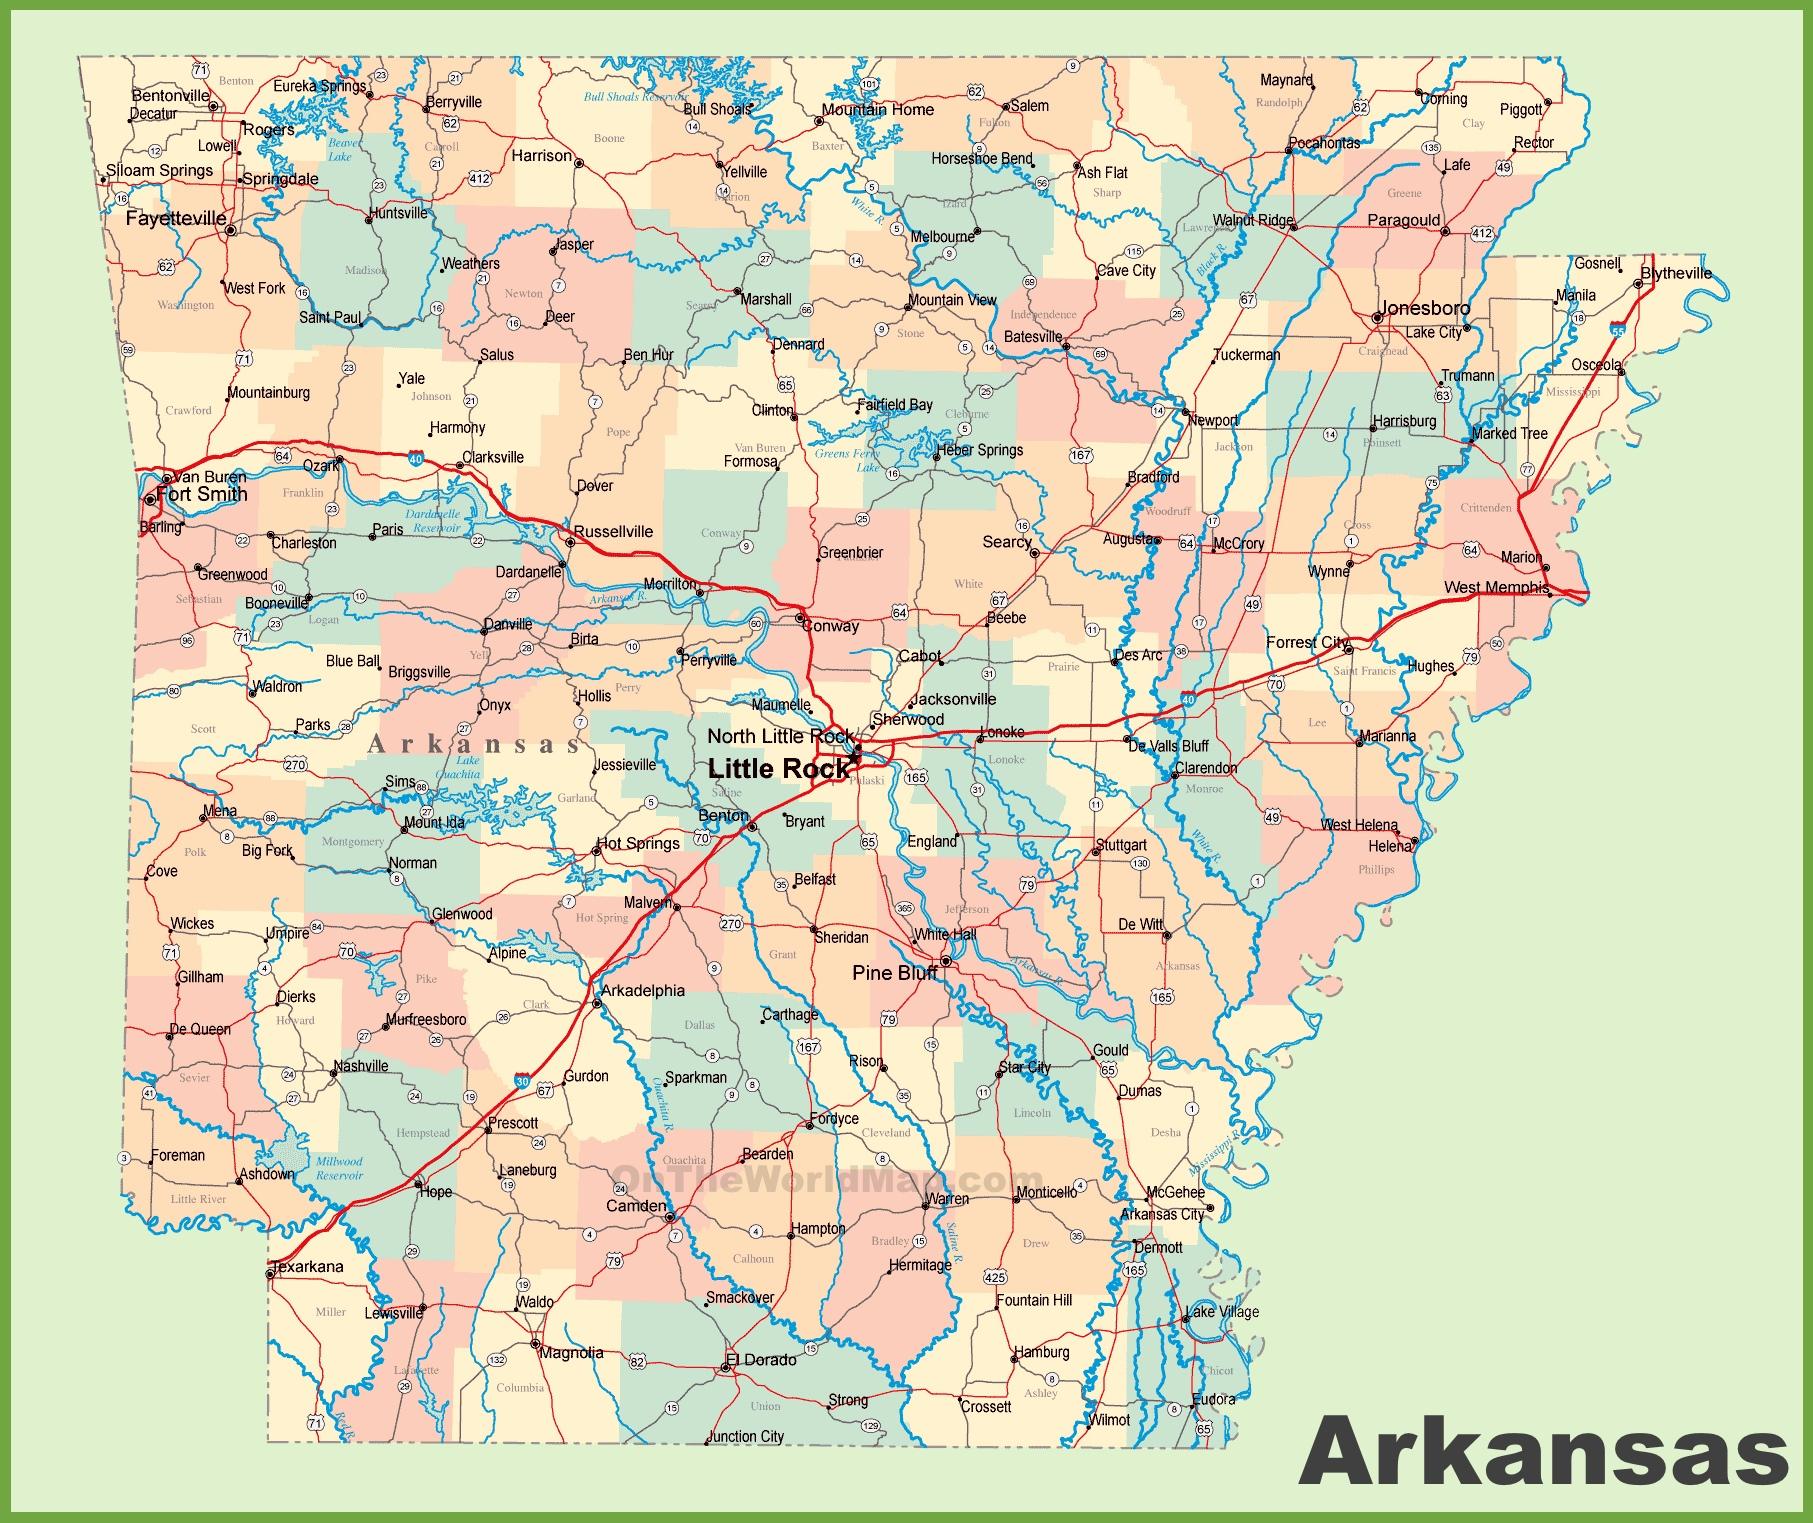 Texas, Oklahoma, Kansas, Missouri, Louisiana, Mississipi ...